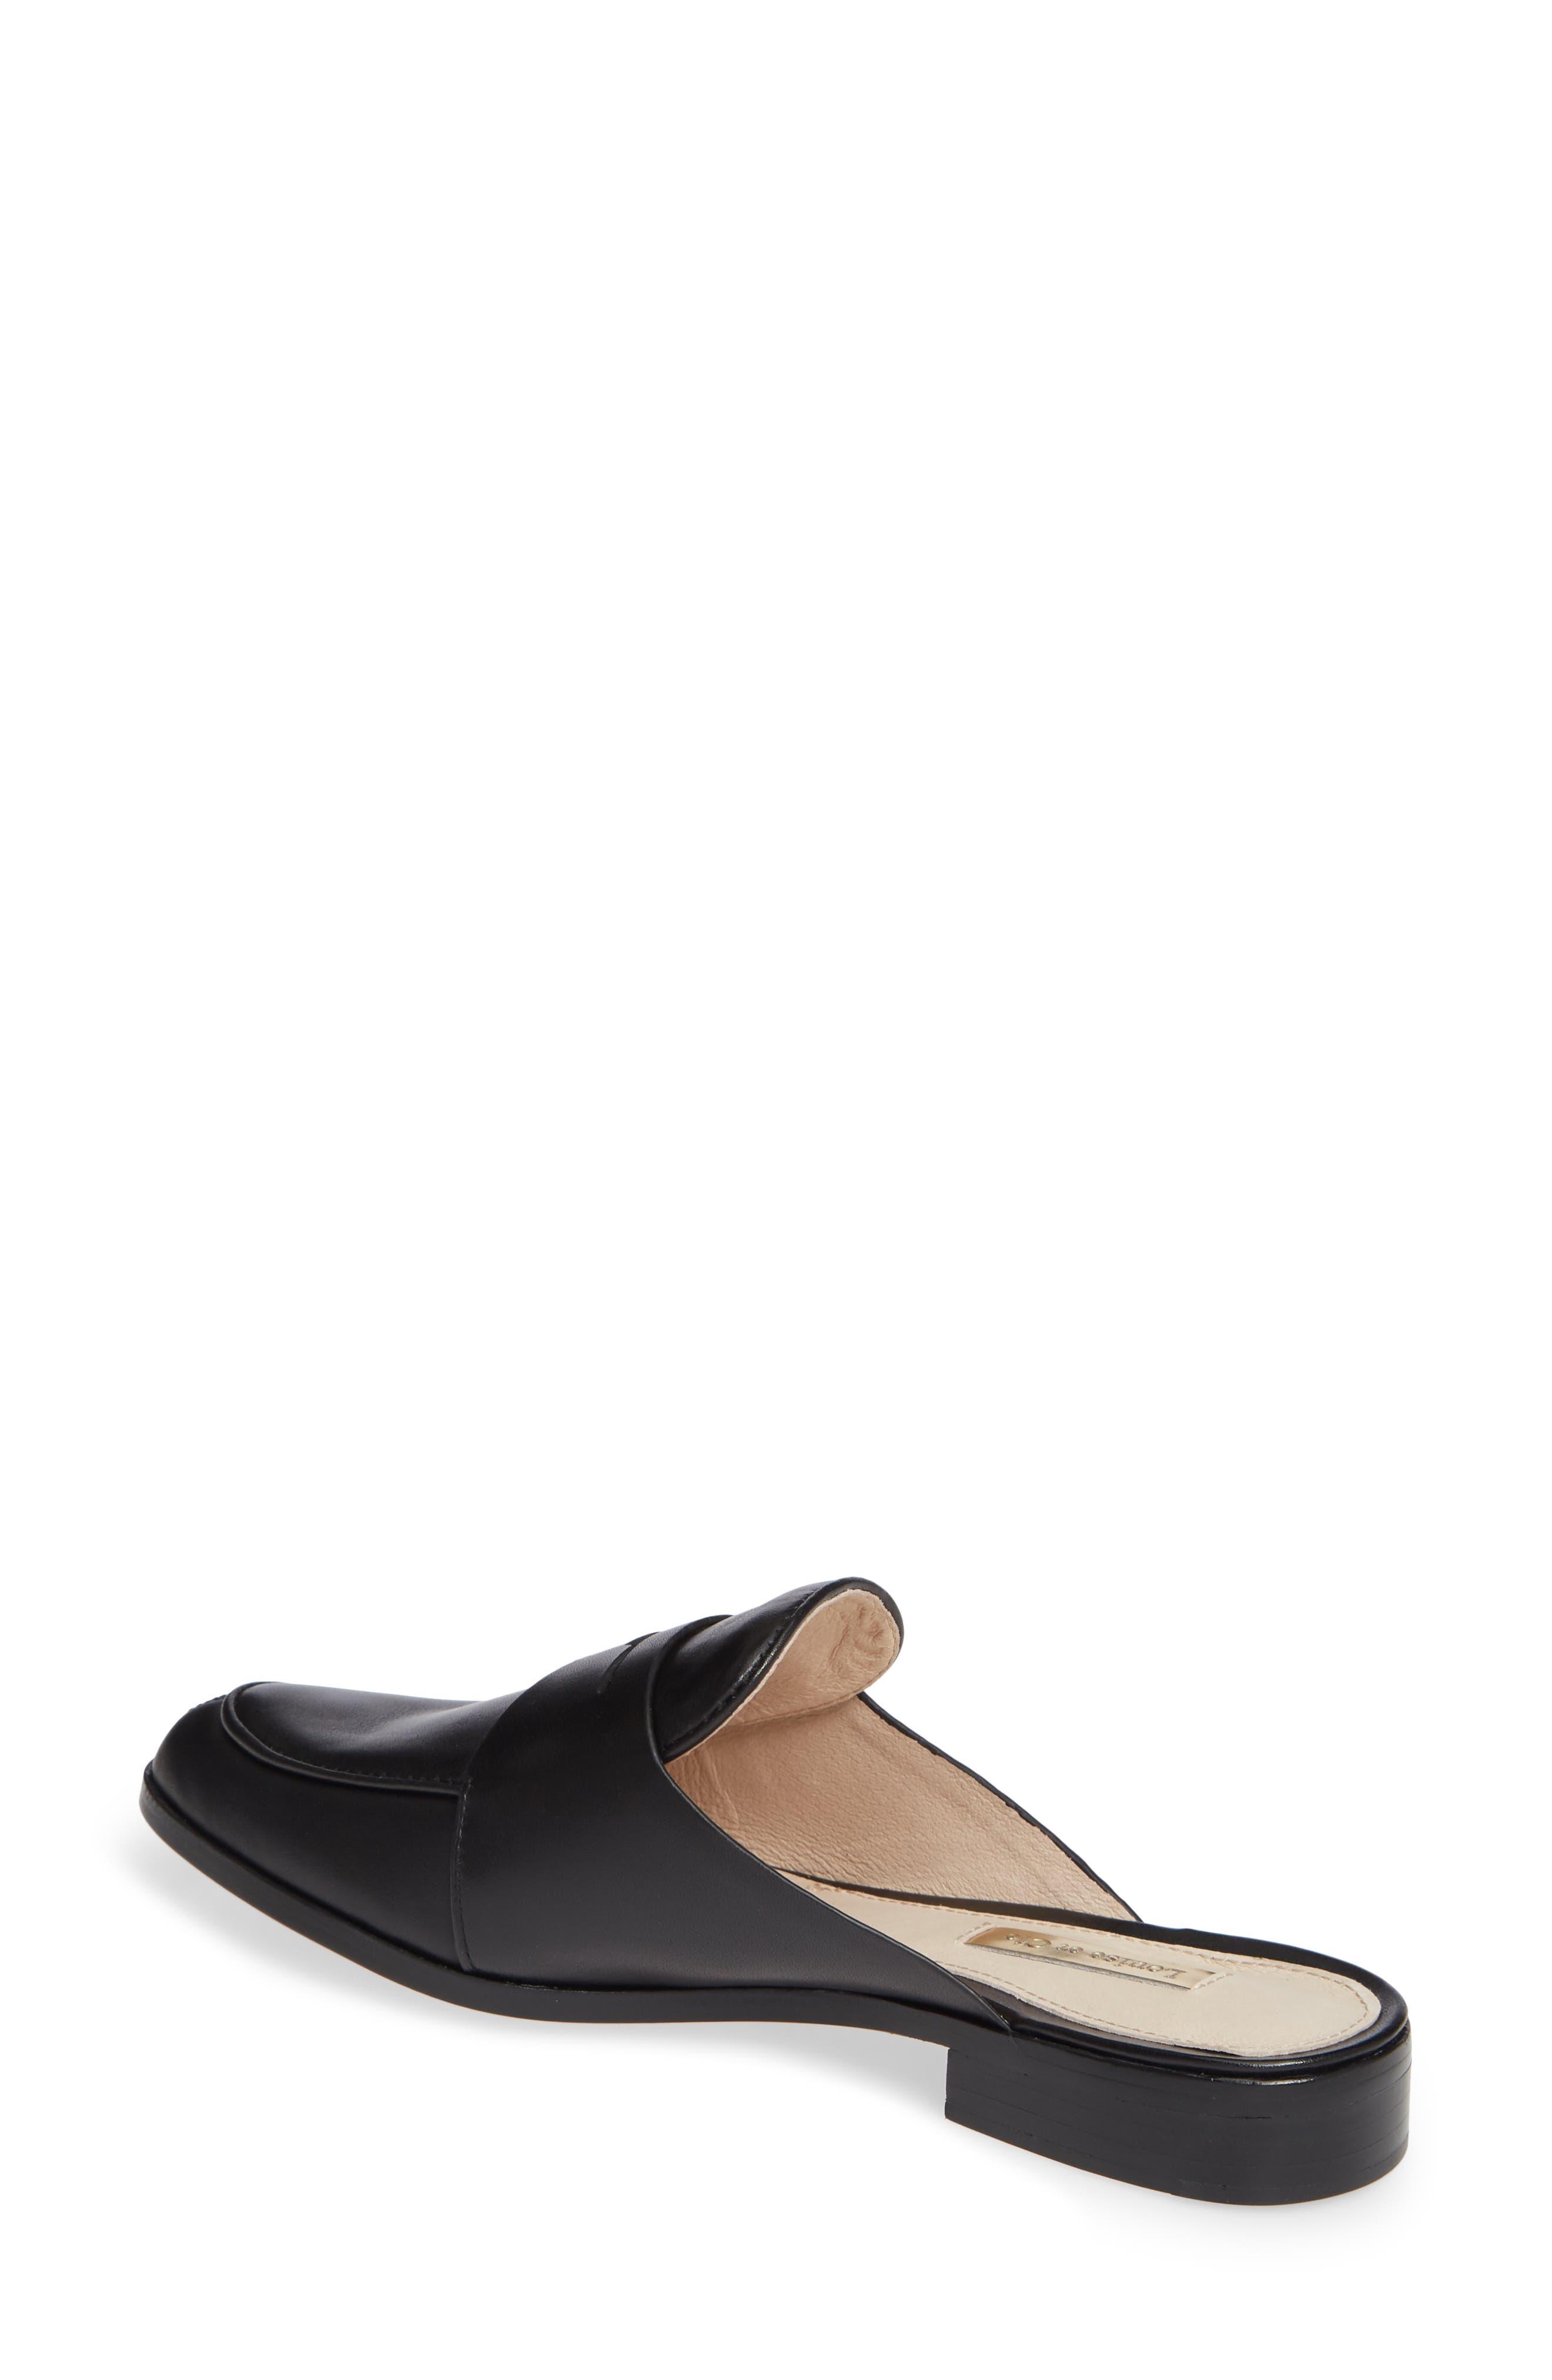 LOUISE ET CIE, Dugan Flat Loafer Mule, Alternate thumbnail 2, color, BLACK/BLACK LEATHER